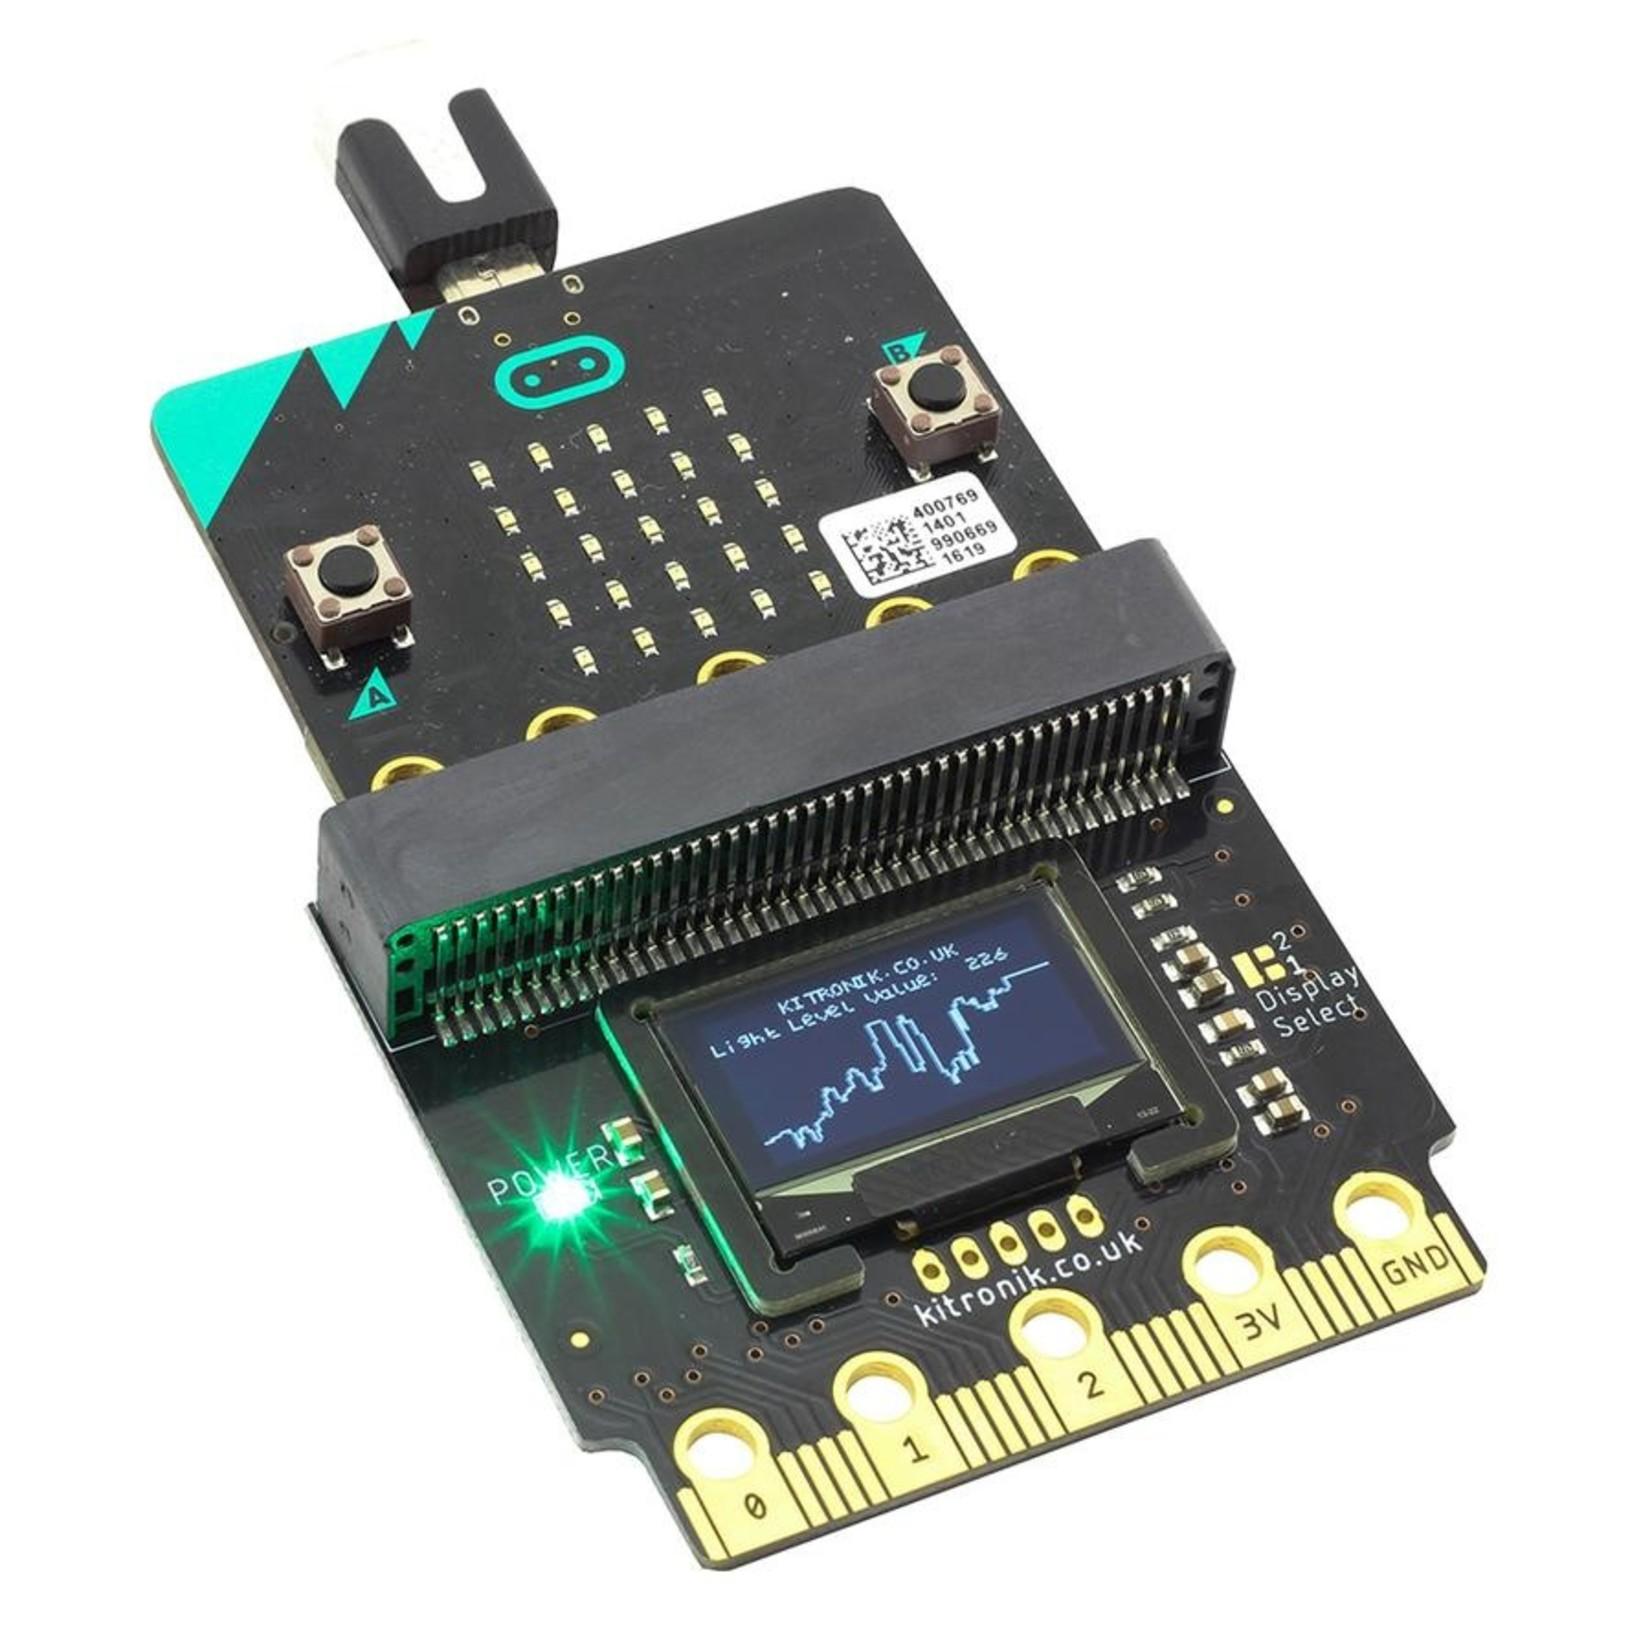 Kitronik :VIEW Graphics128 OLED display 128x64 for BBC micro:bit